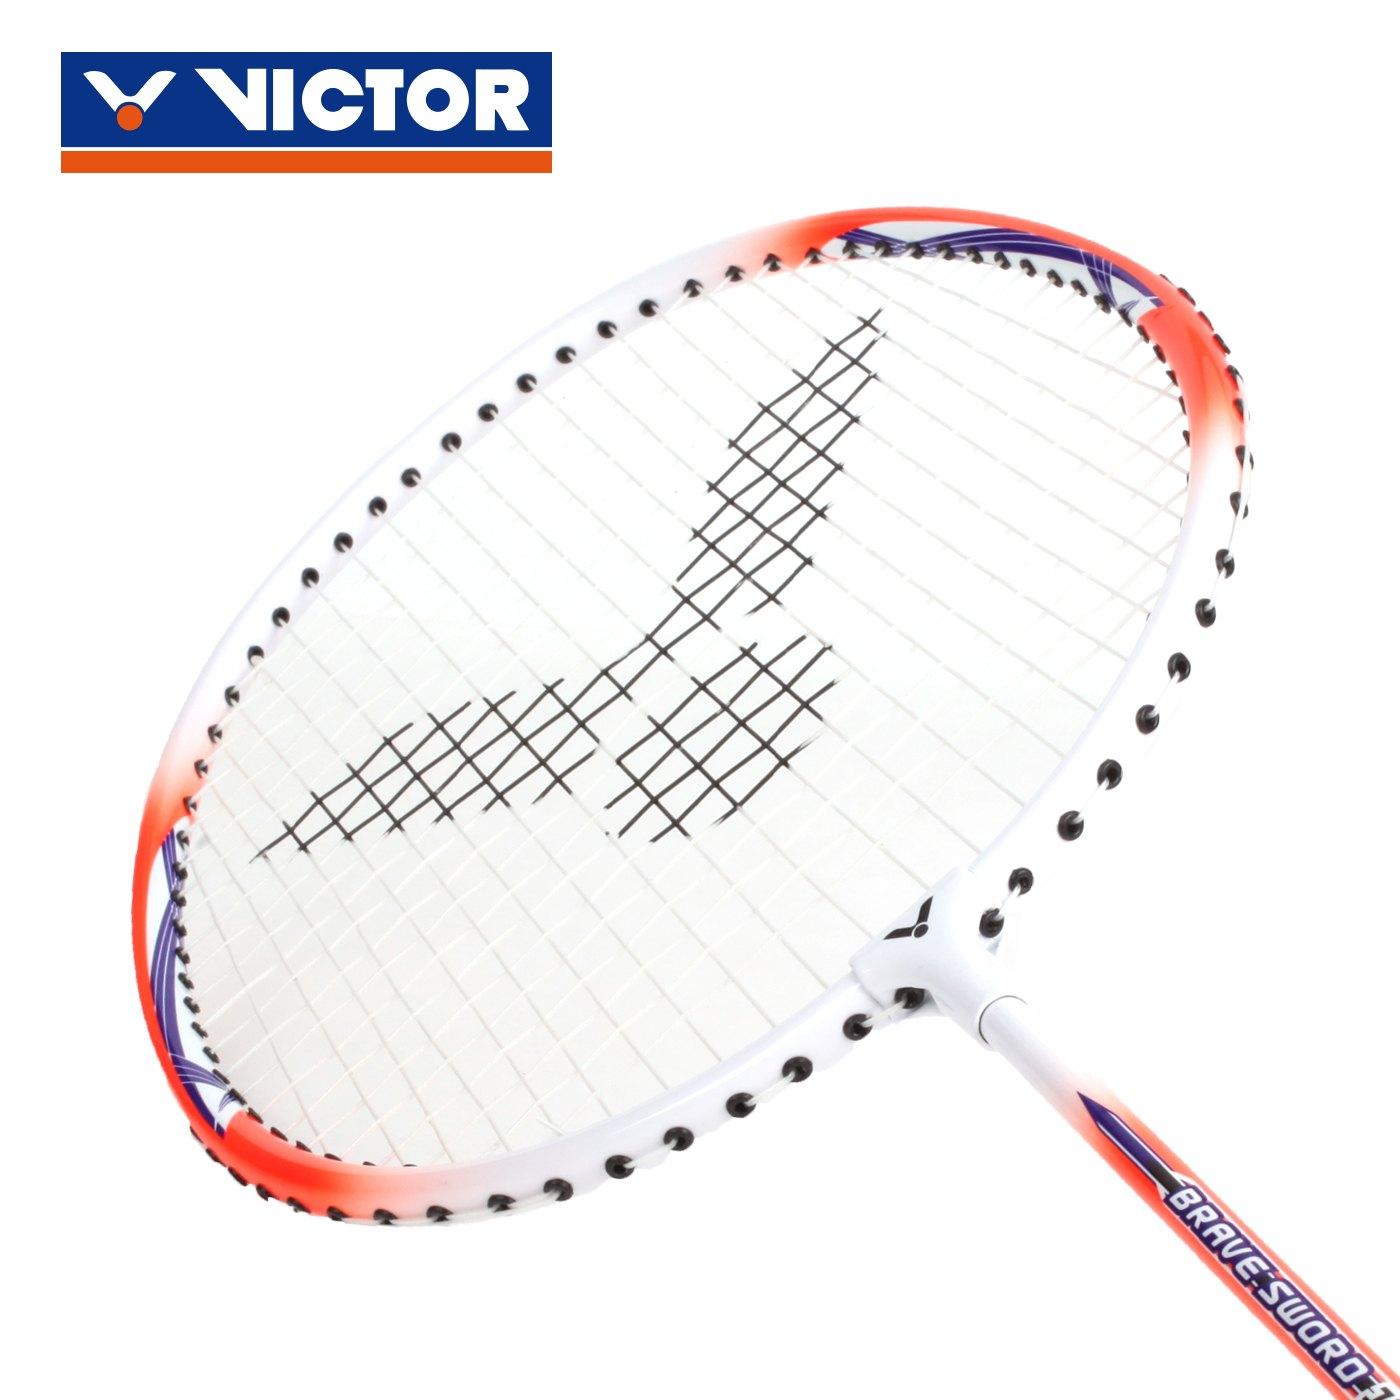 VICTOR 亮劍穿線拍 (羽球 羽毛球拍 訓練 勝利【99301852】≡排汗專家≡